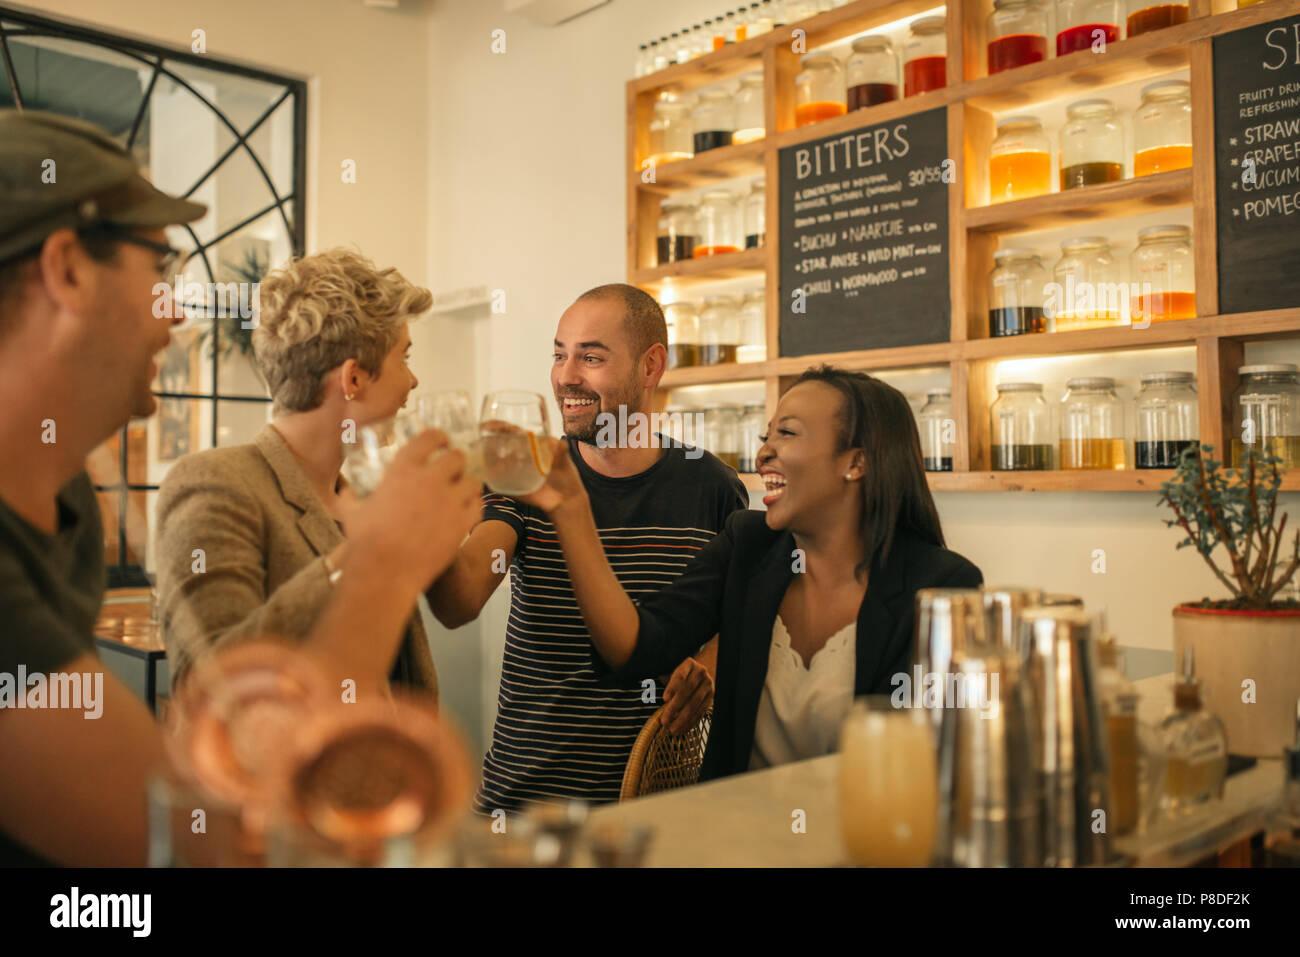 Amigos sonrientes vítores con bebidas en un bar de moda Imagen De Stock